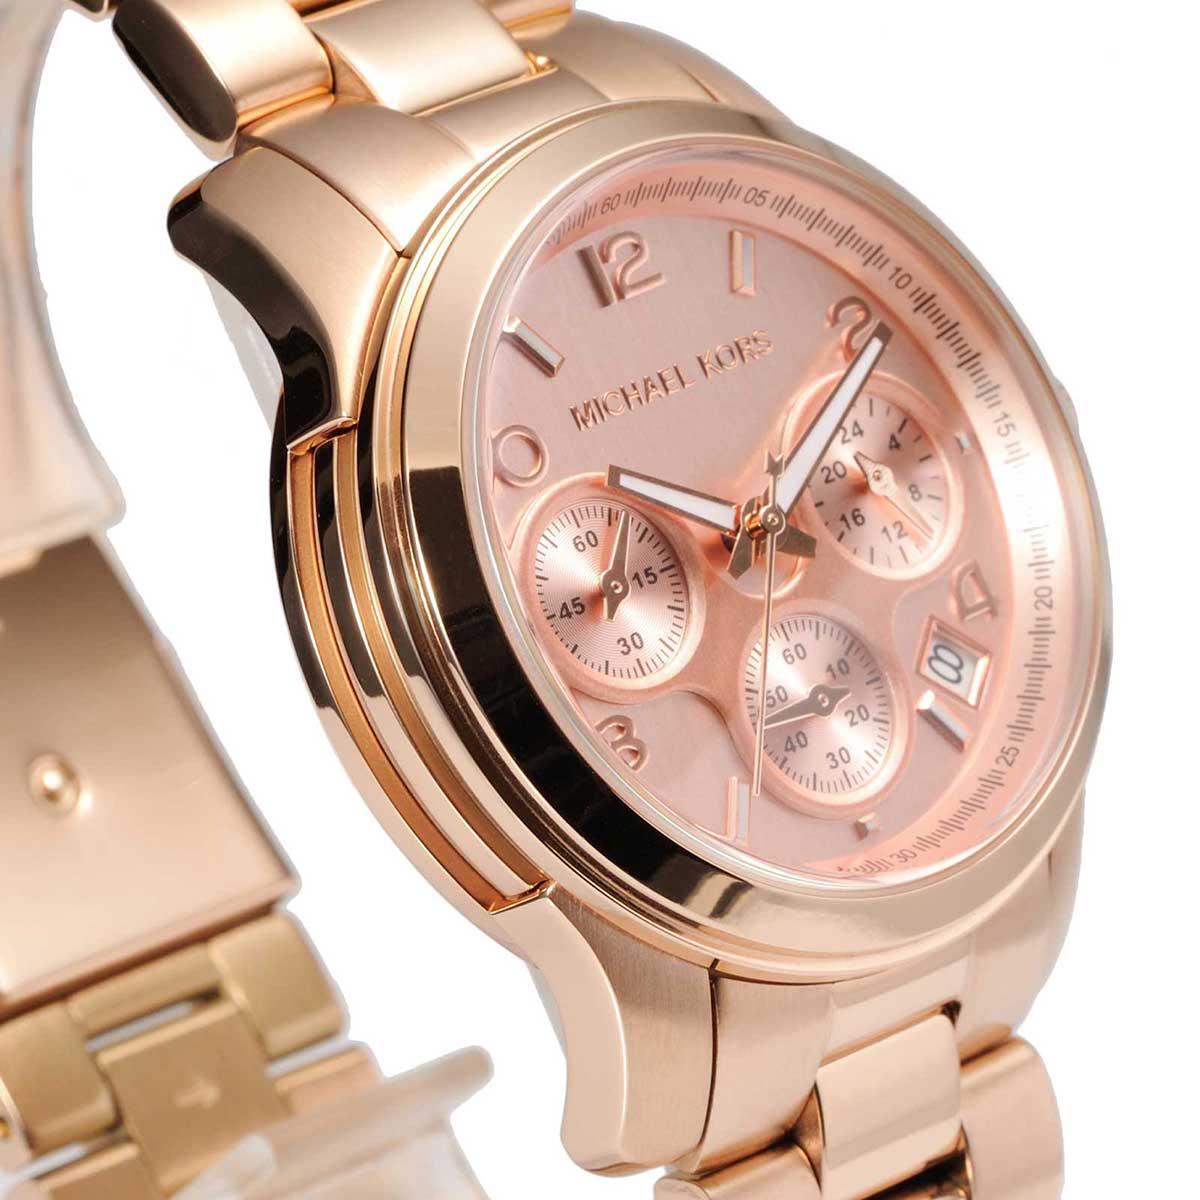 37fac12b2c53 Michael Kors Runway Chronograph Gold Dial Ladies Watch MK5128 ...